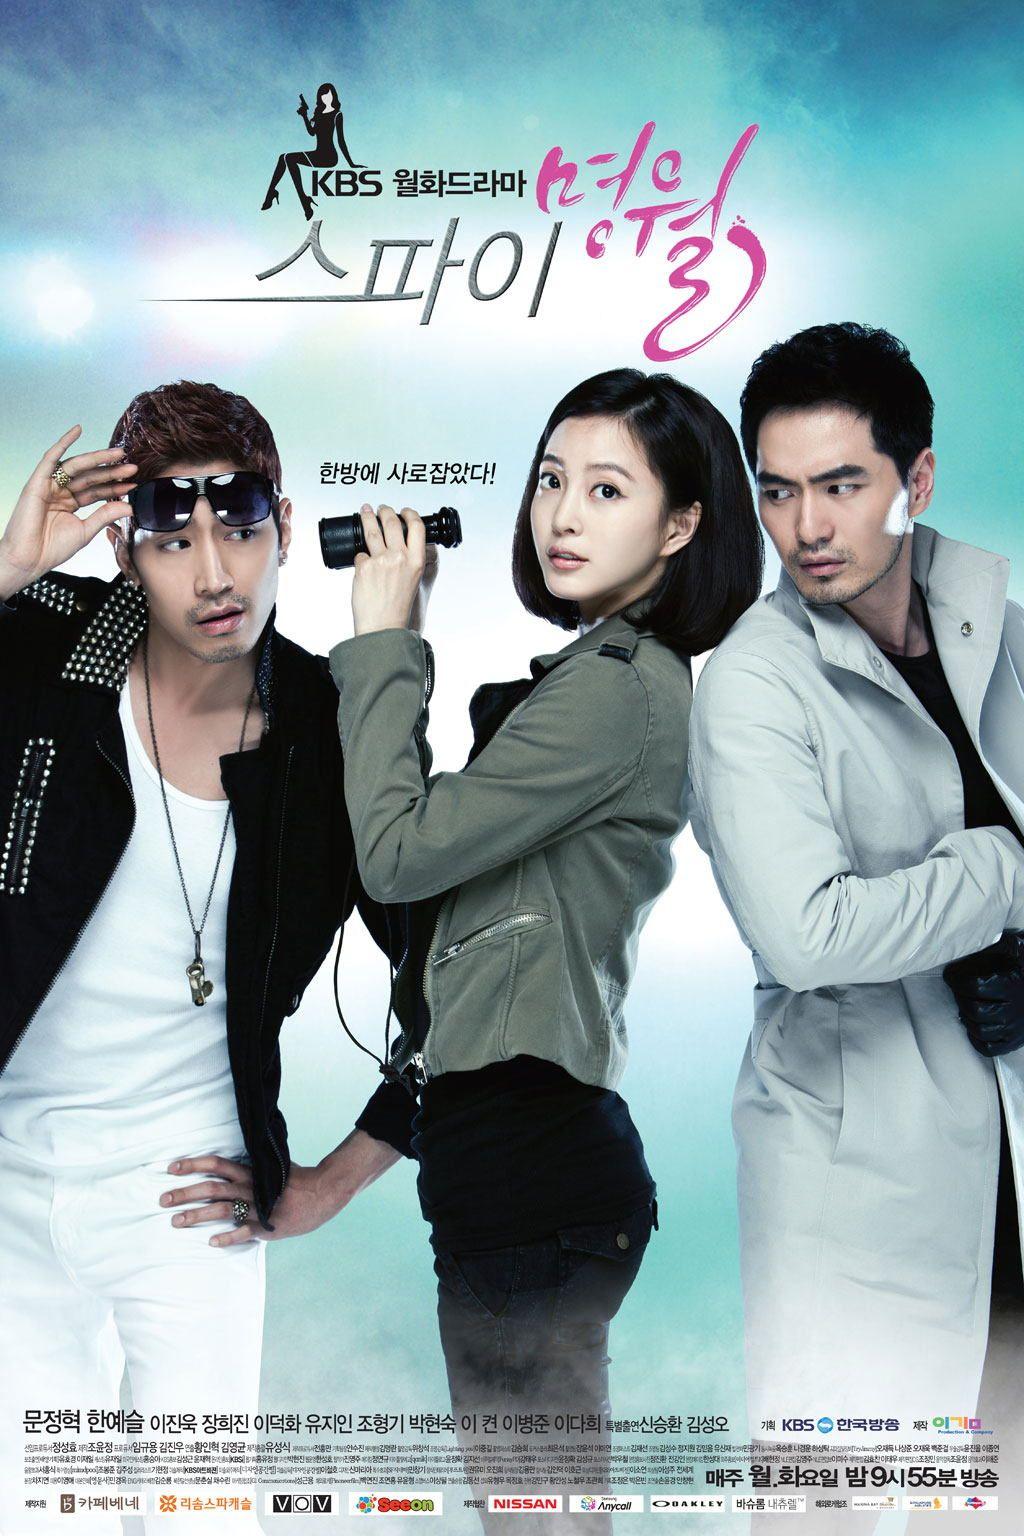 Korean Drama Starting Today 2011 07 11 In Korea Korean Drama Movies Korean Drama Tv All Korean Drama